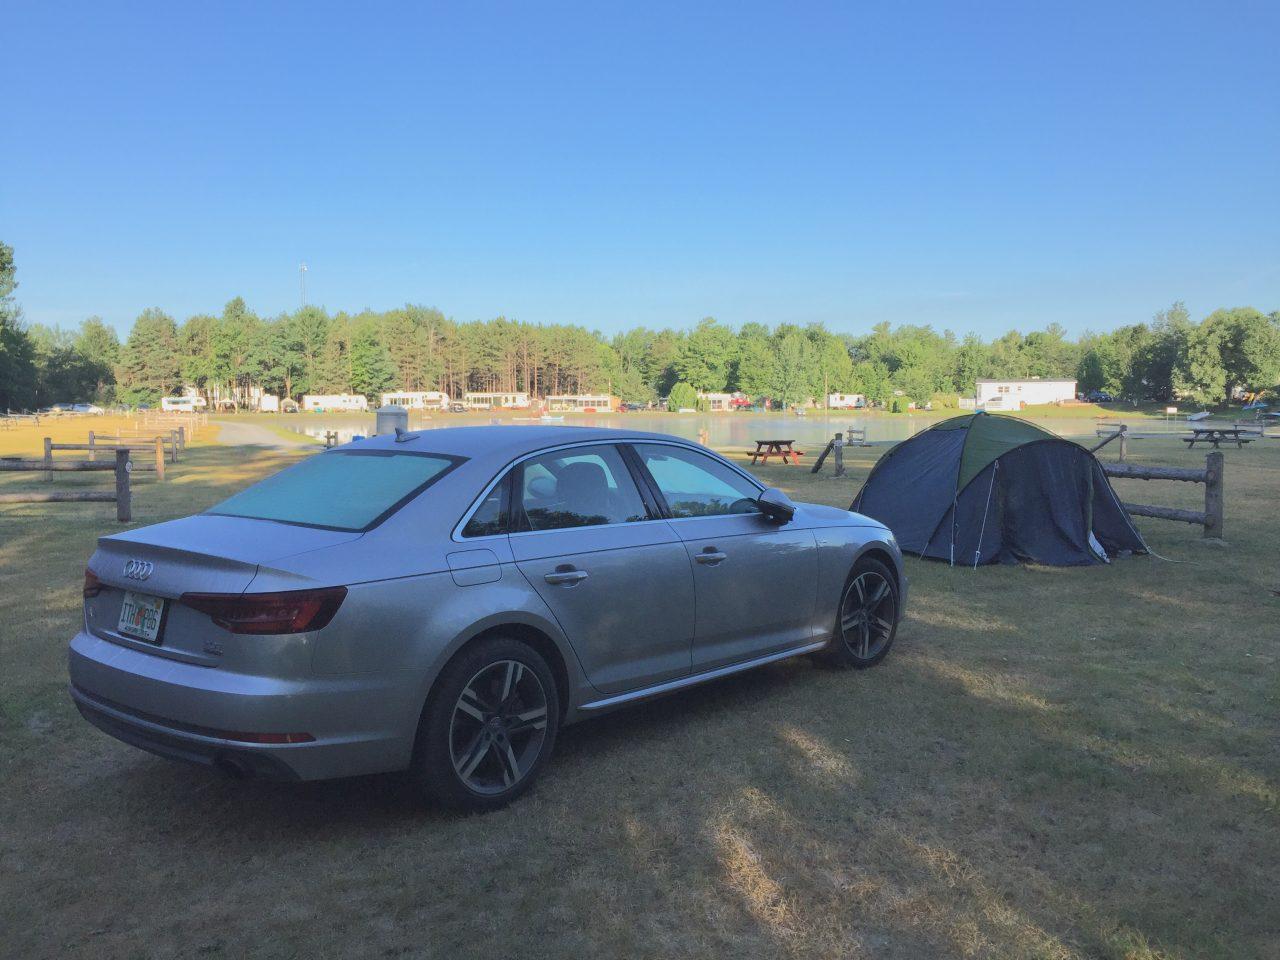 Camping Ausflug nach Kanada